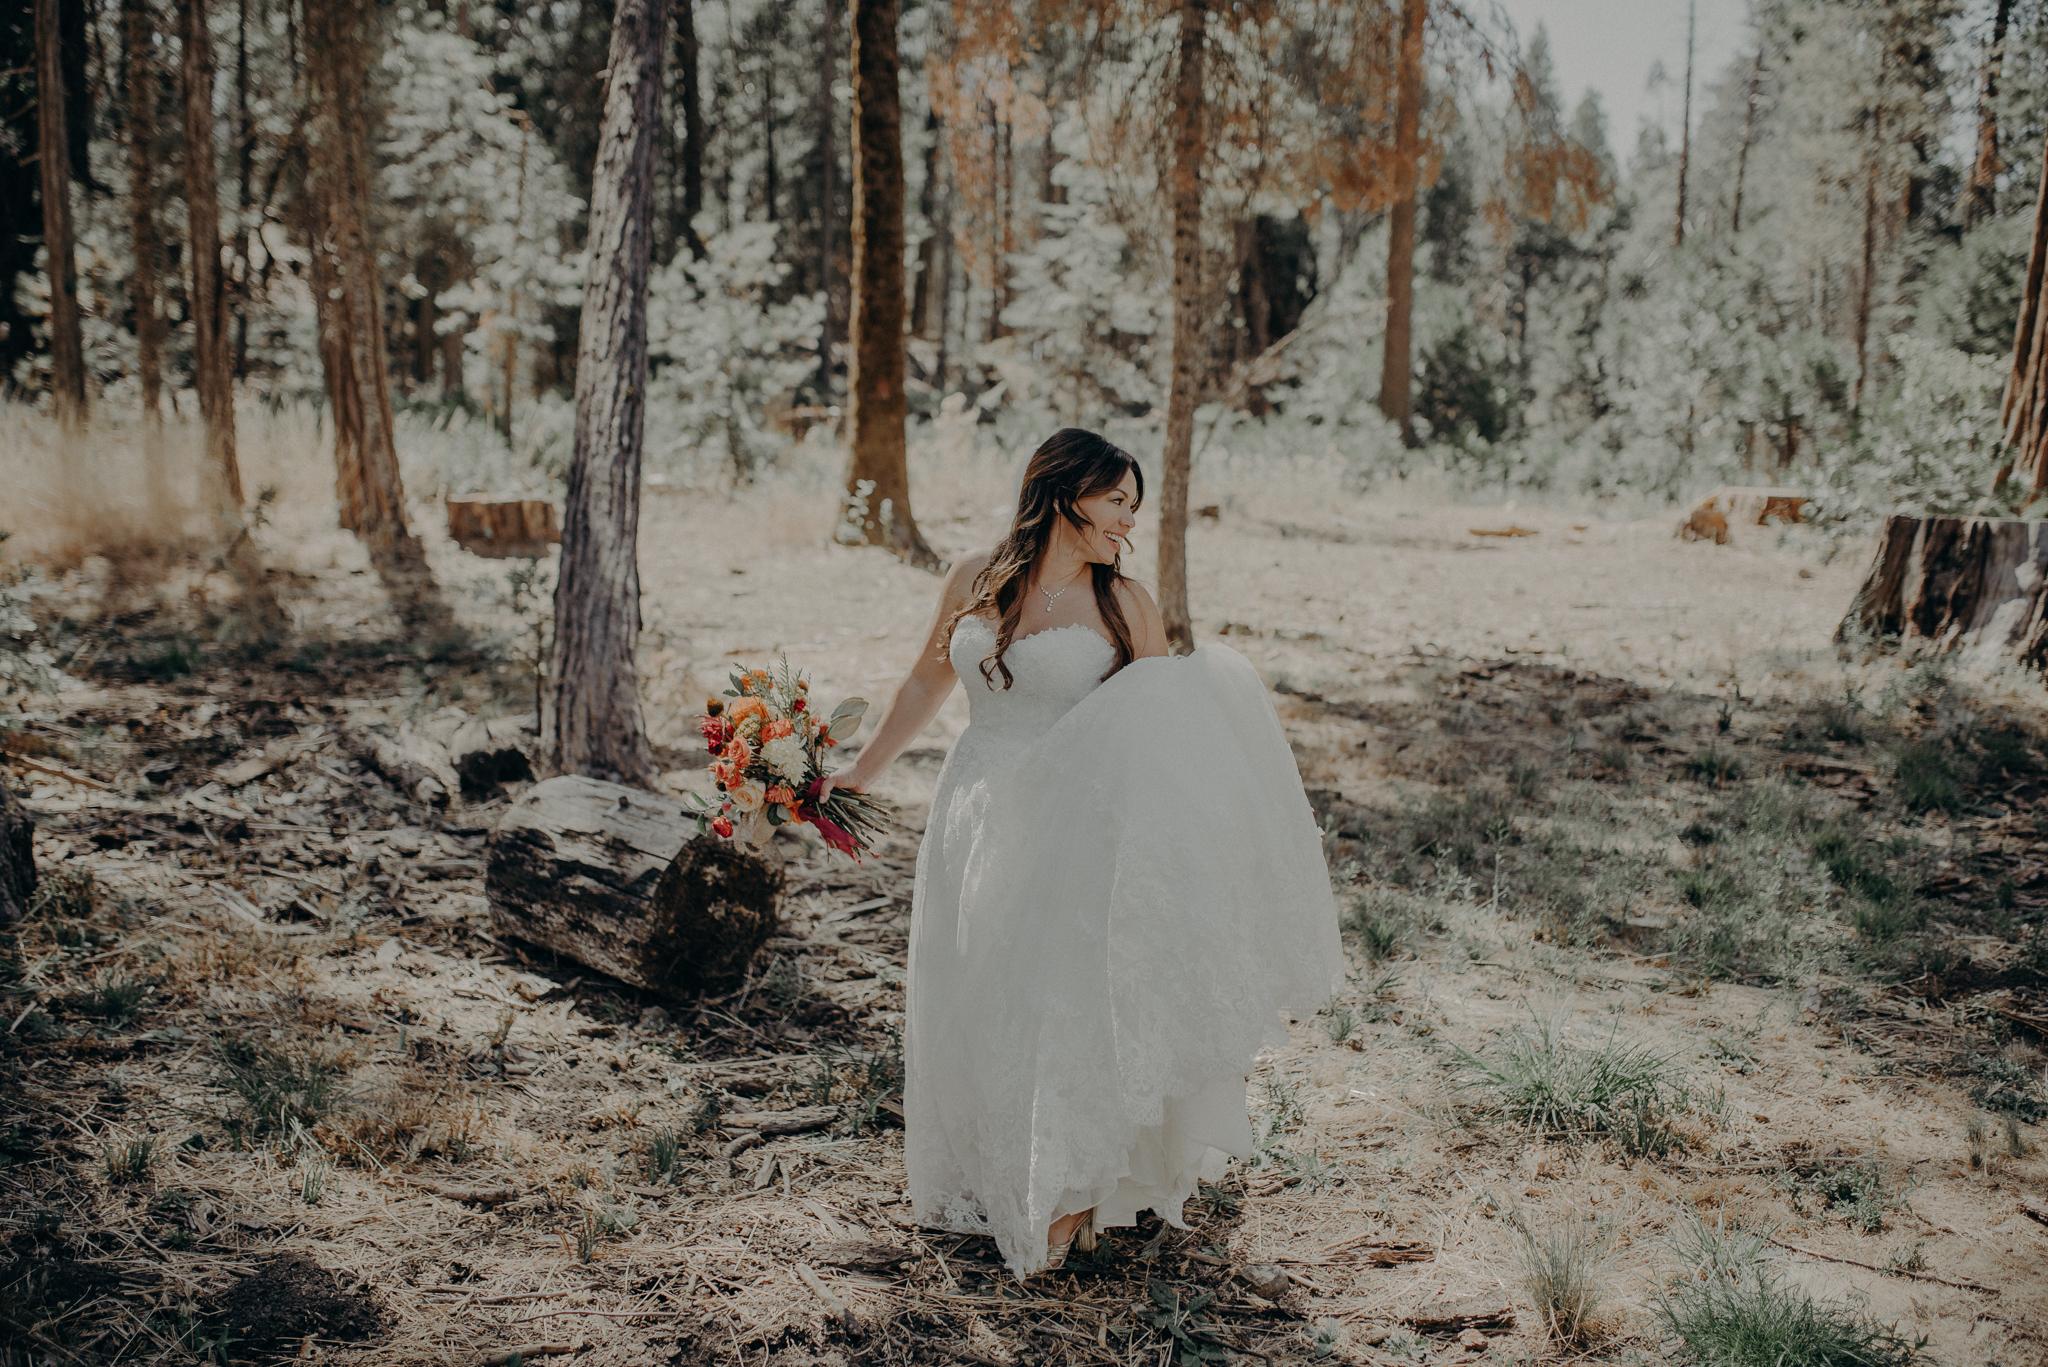 Yosemite Elopement Photographer - Evergreen Lodge Wedding Photographer - IsaiahAndTaylor.com-070.jpg